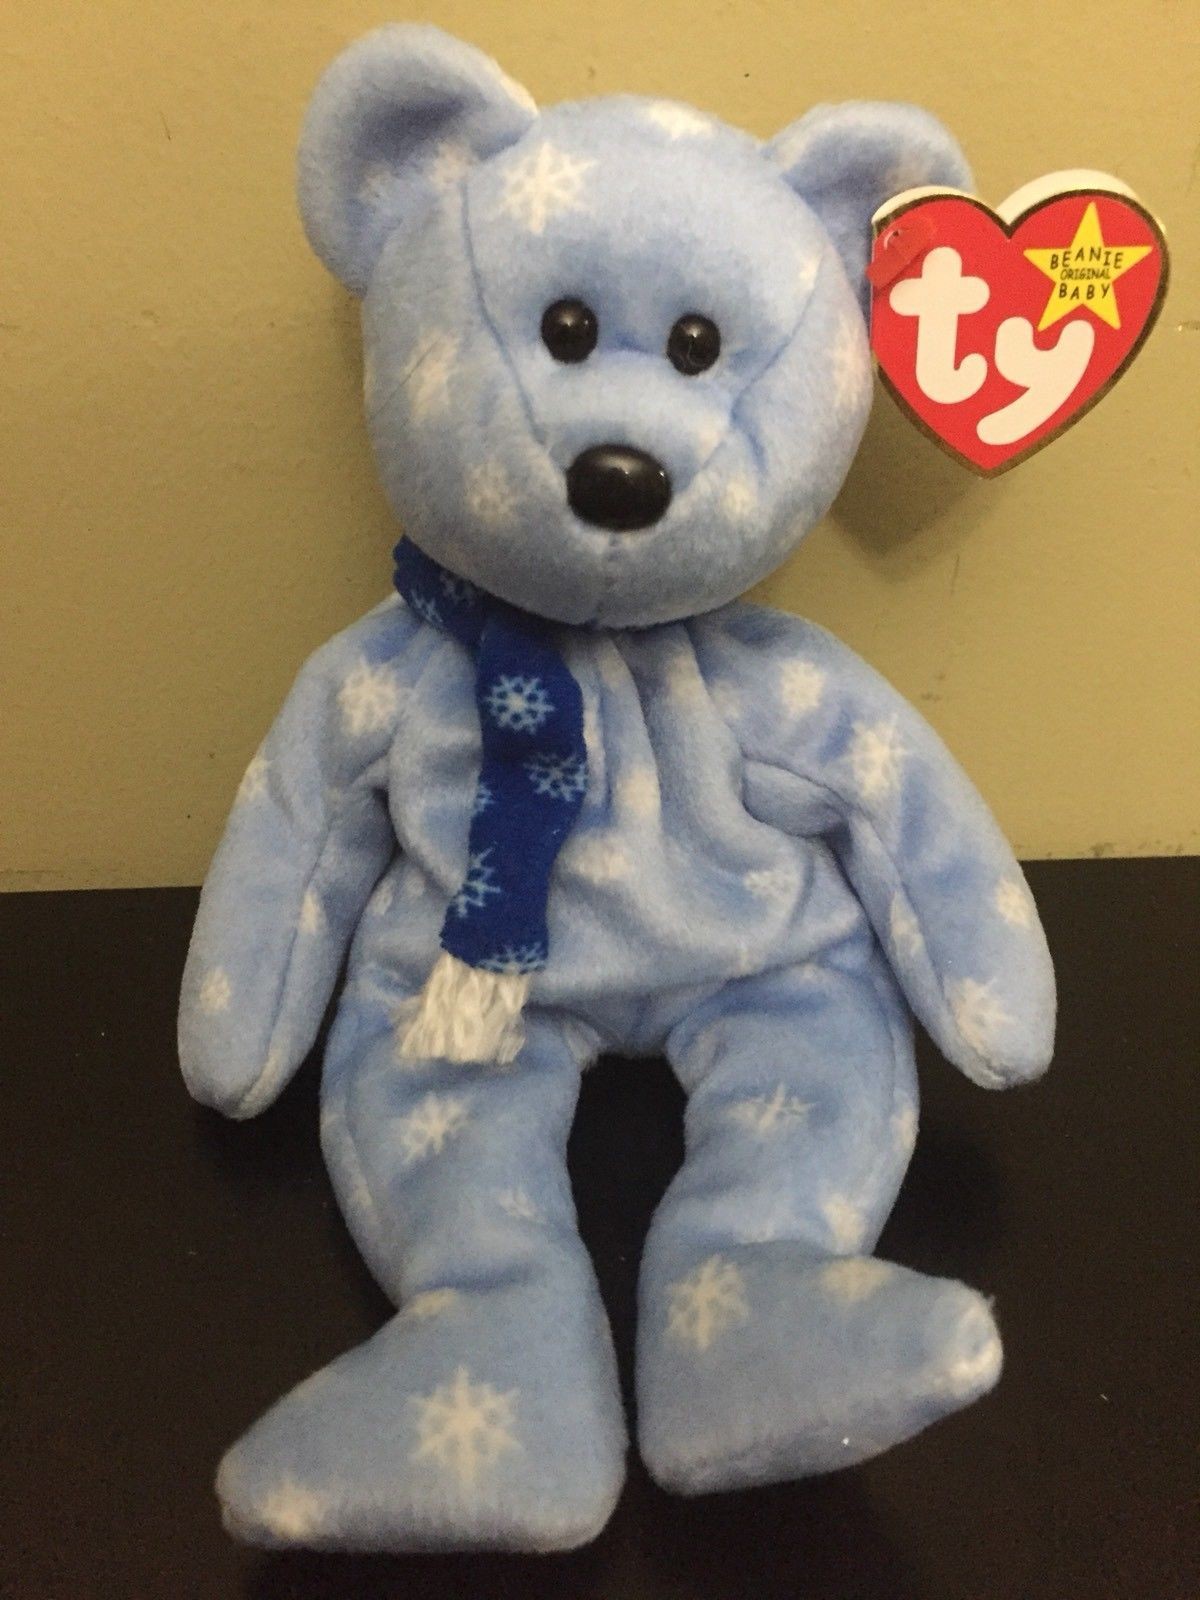 abbee14a67a Ty Beanie Baby 1999 Holiday Teddy Bear Blue and 50 similar items. S l1600